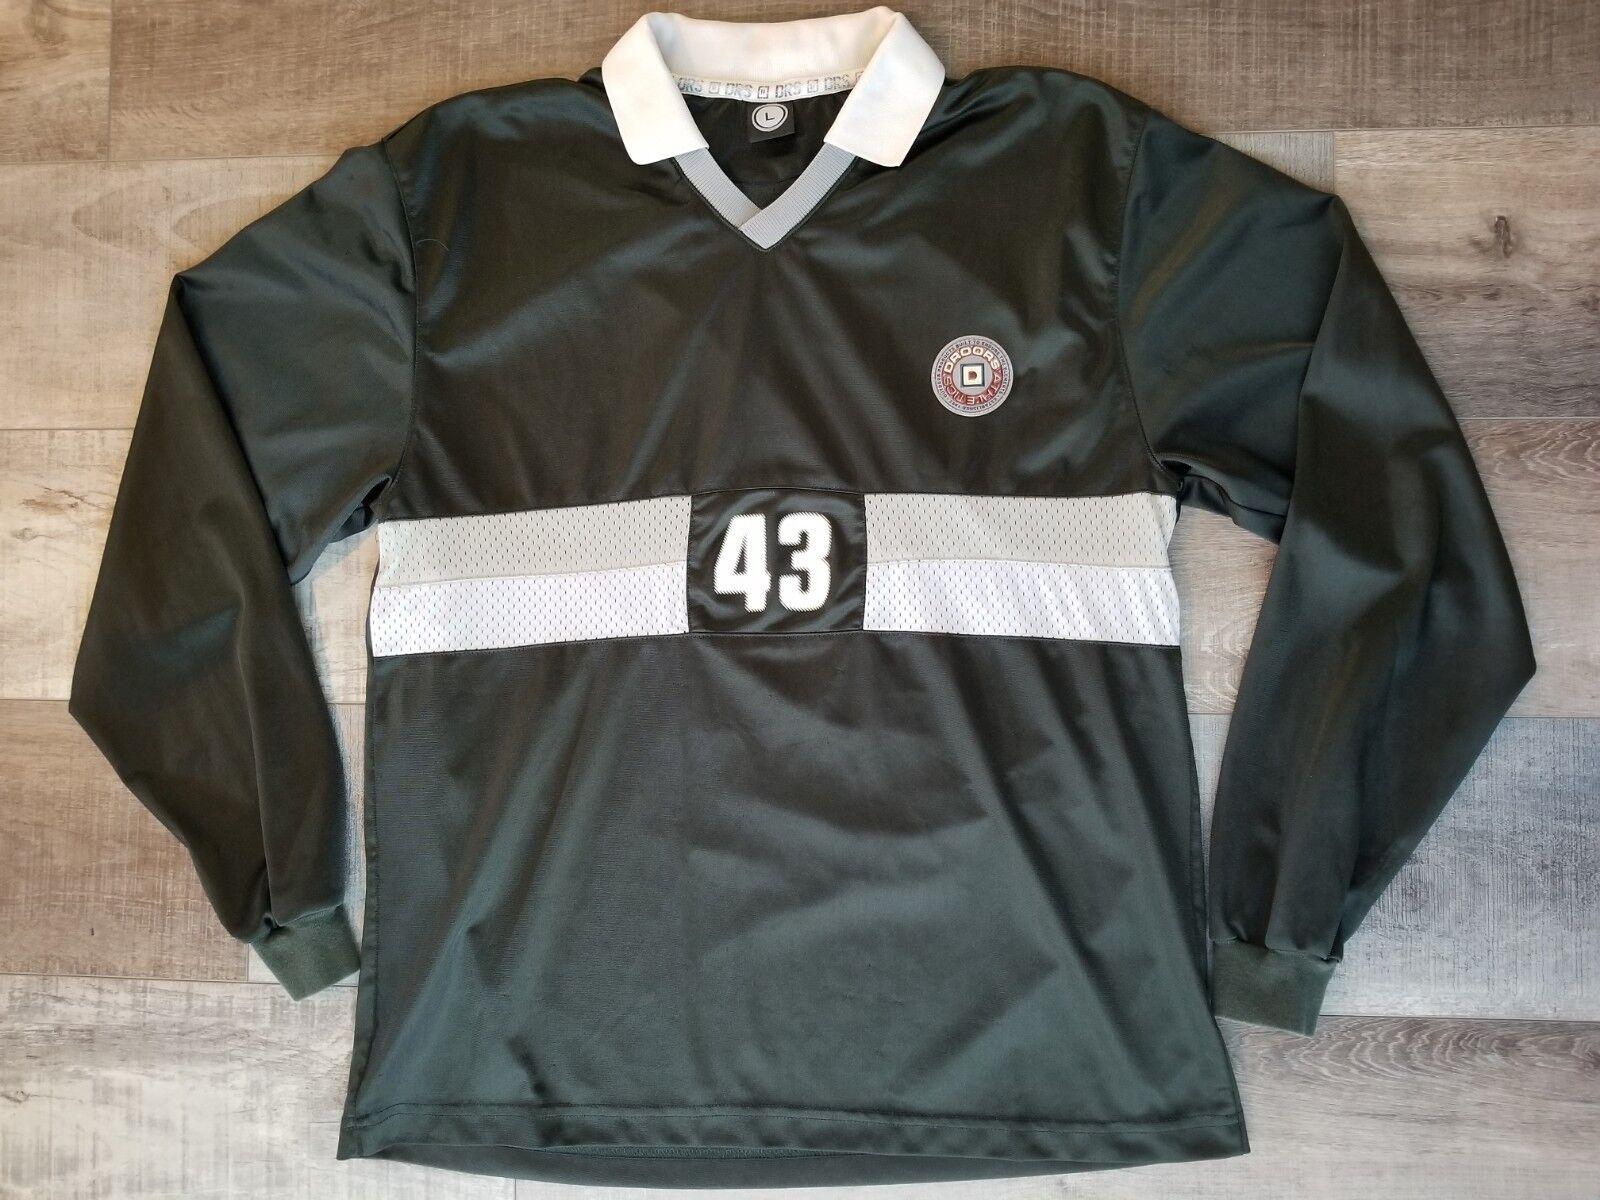 Droors jersey vintage 90s longsleeve skate large L